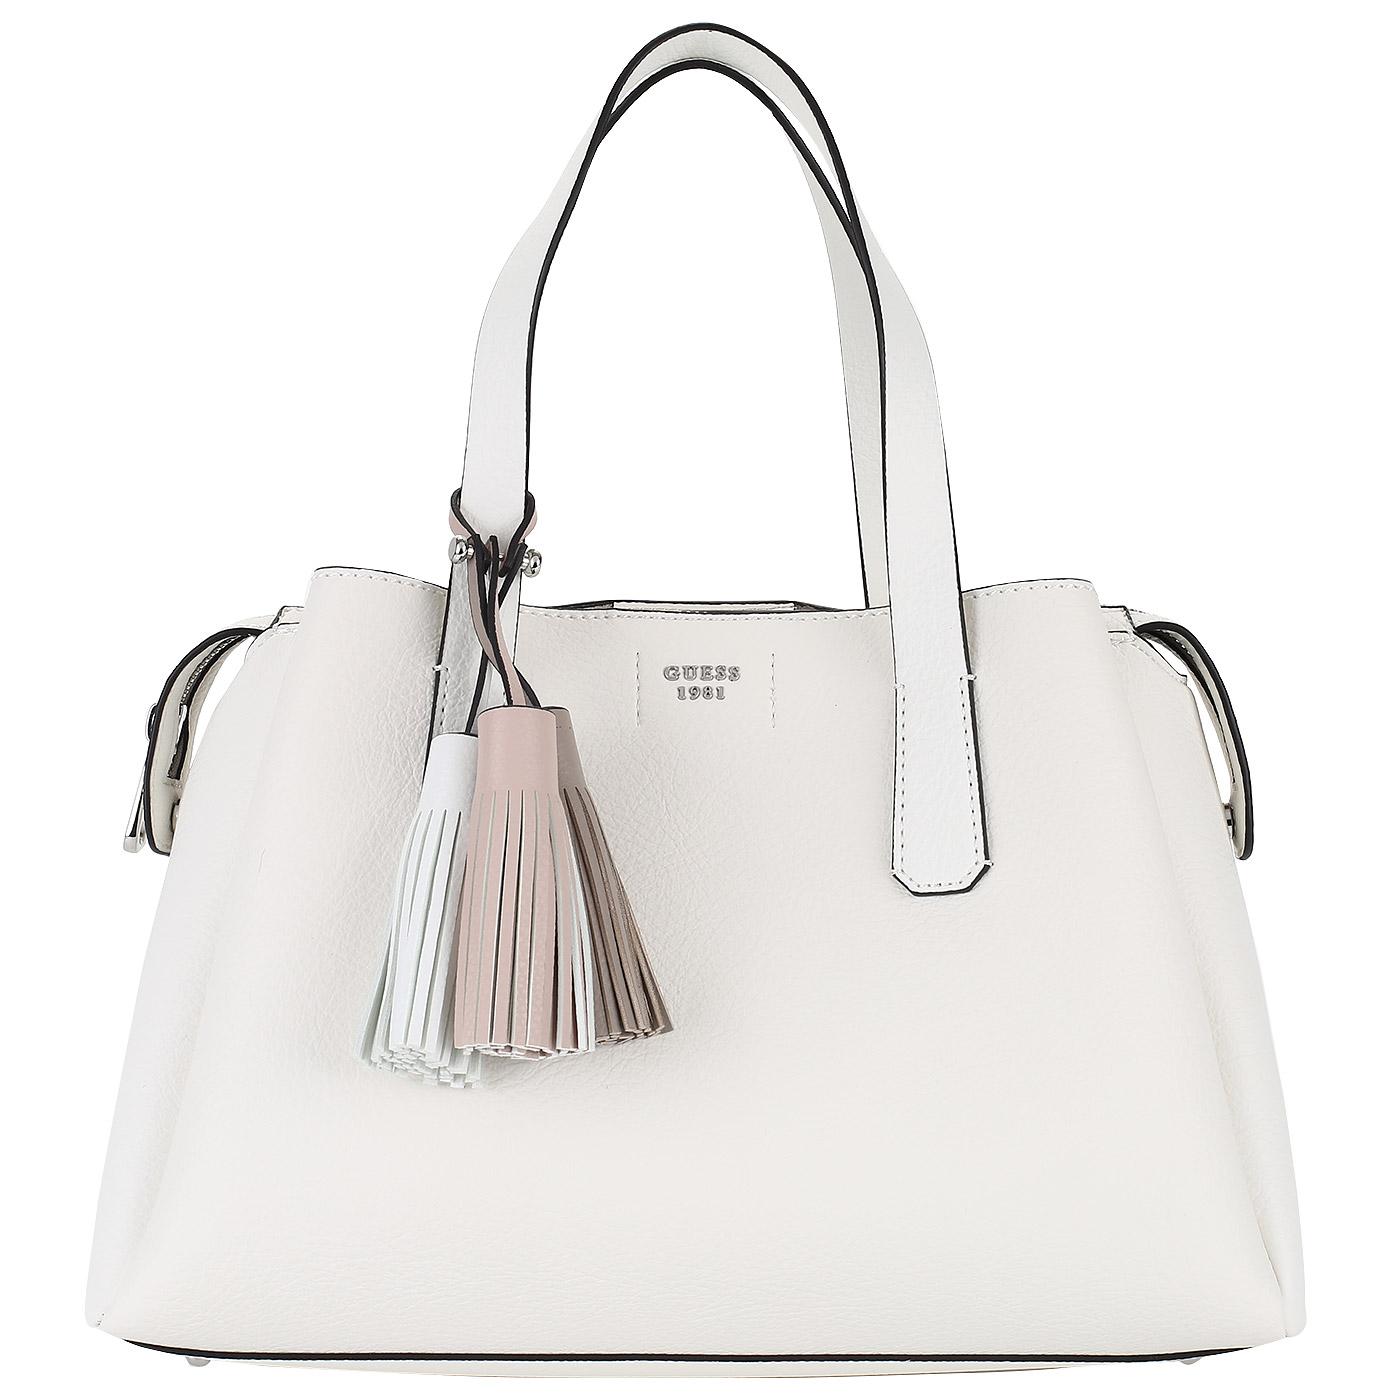 6d3bf1fb14f0 Белая женская сумка Guess Trudy HWVY69 54060_white - 2000557874473 ...